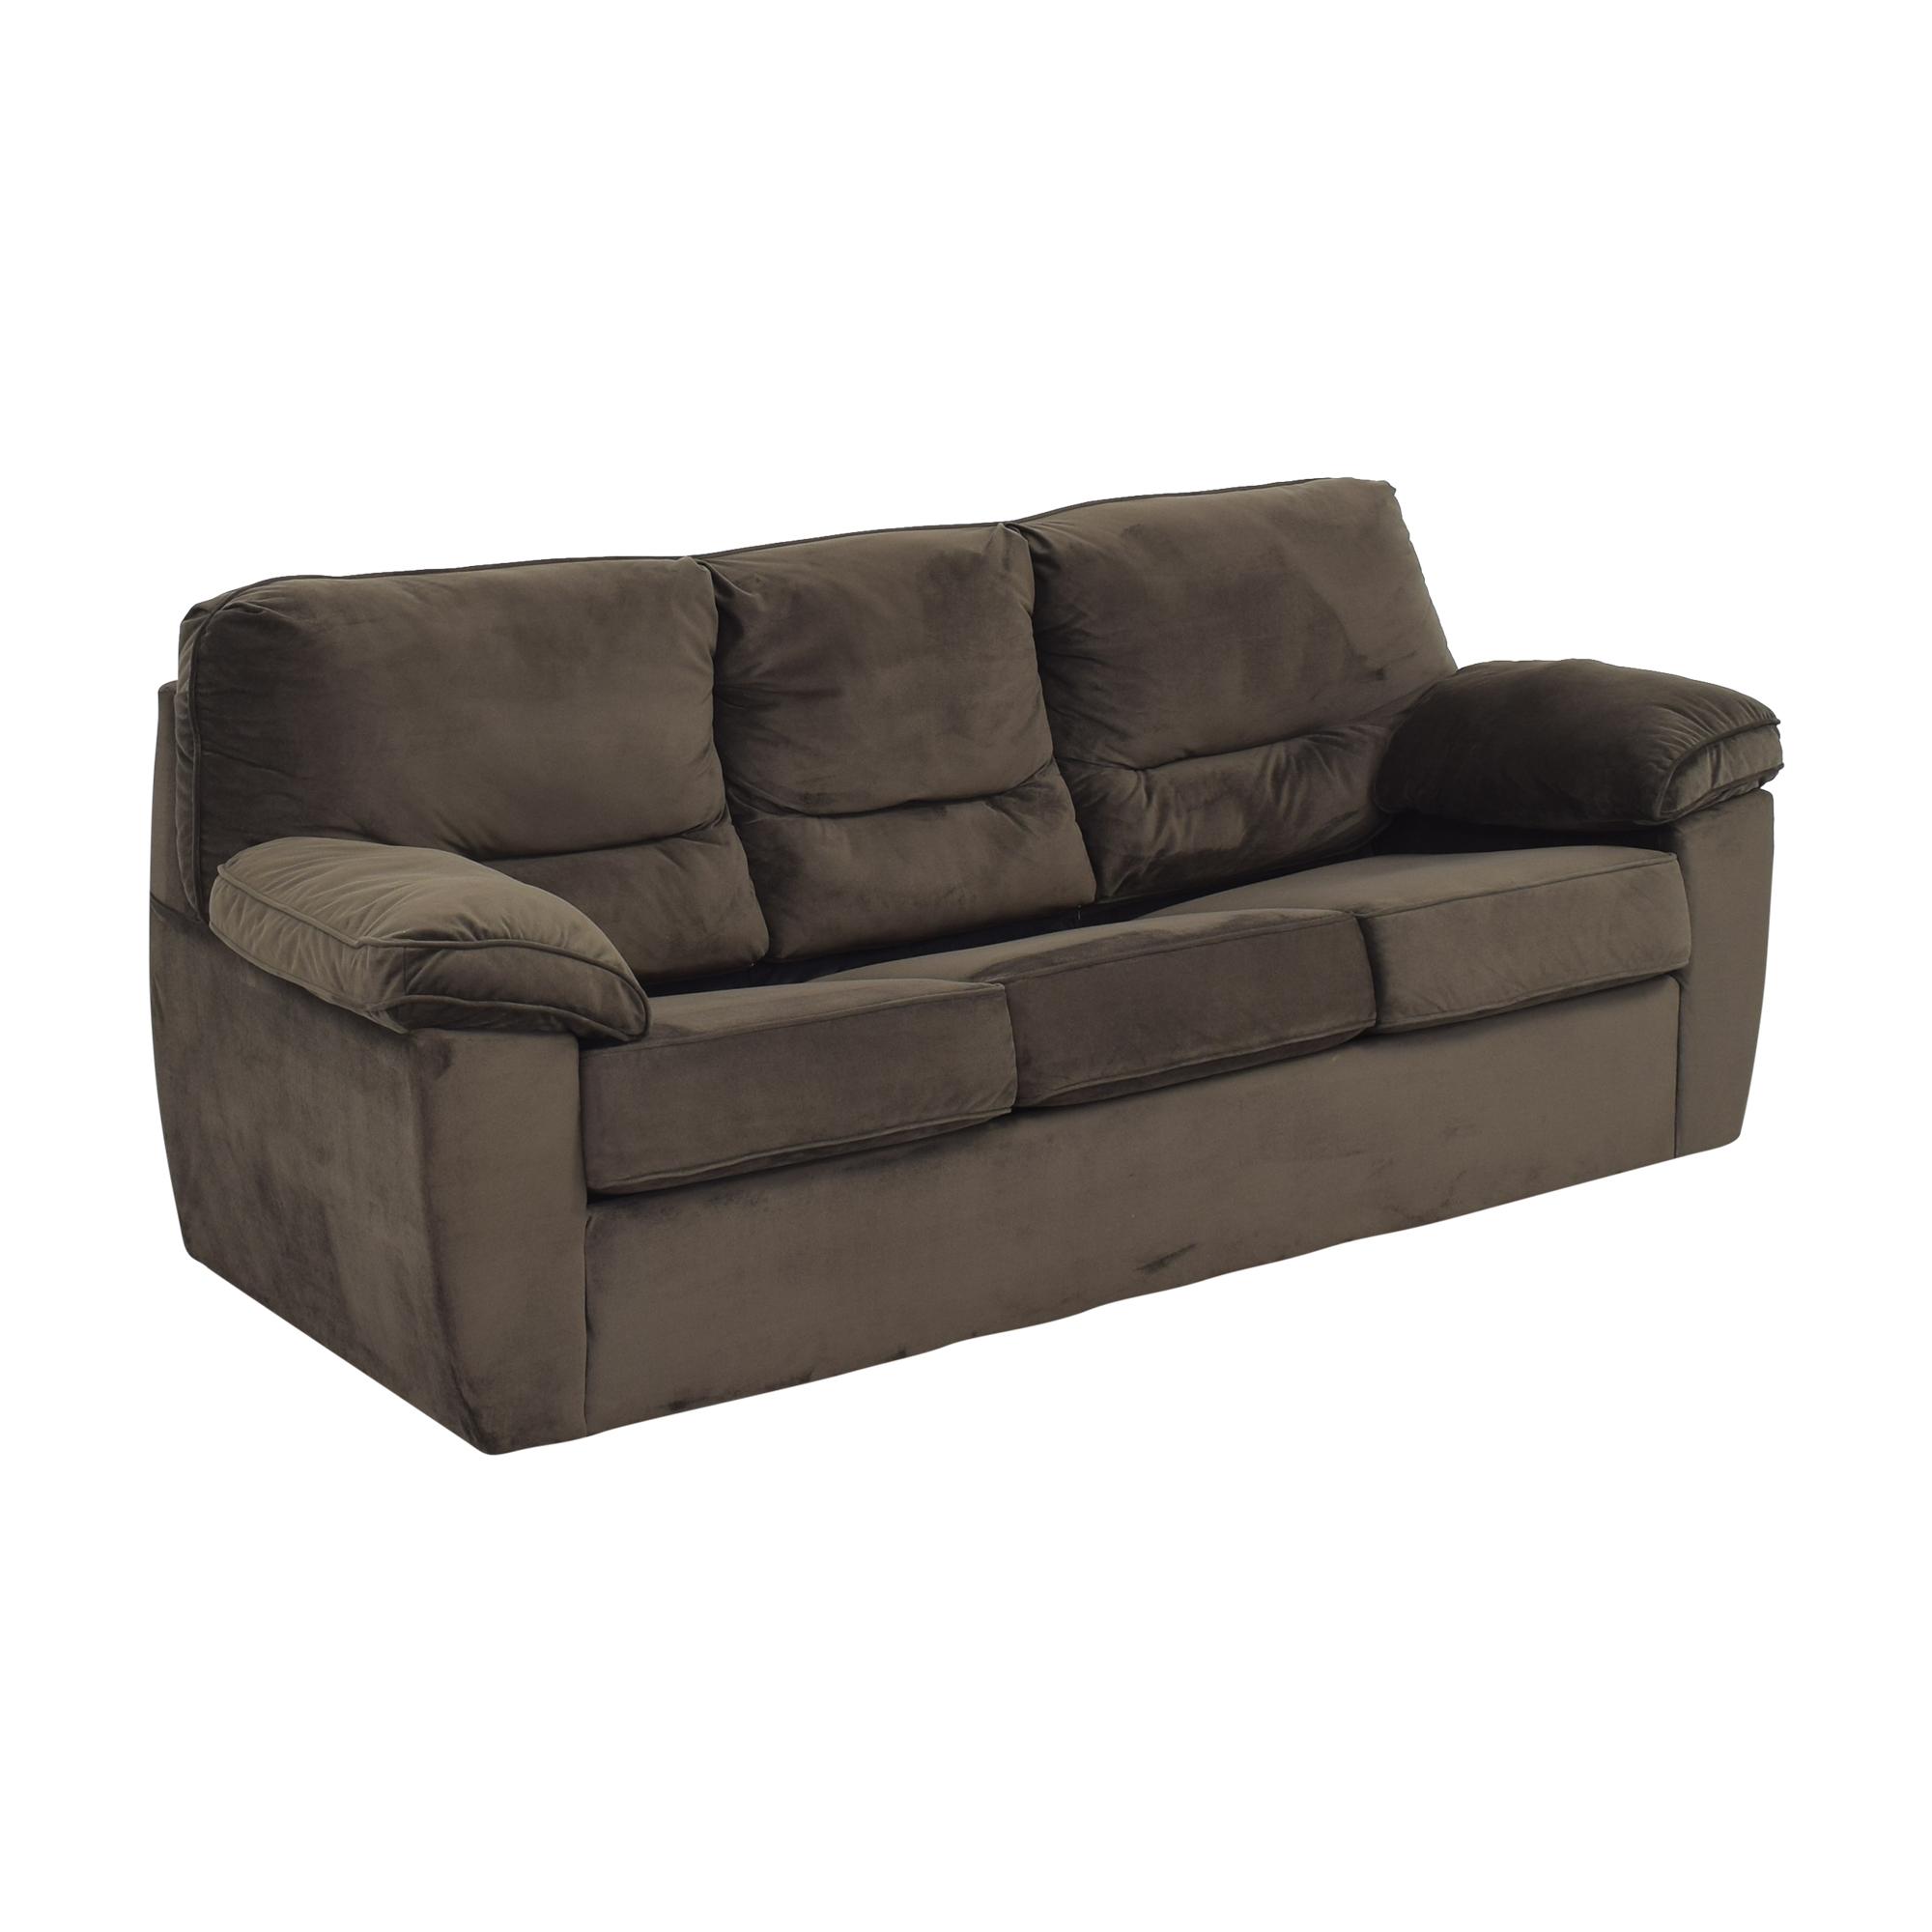 Raymour & Flanigan Raymour & Flanigan Rockport Queen Sleeper Sofa coupon